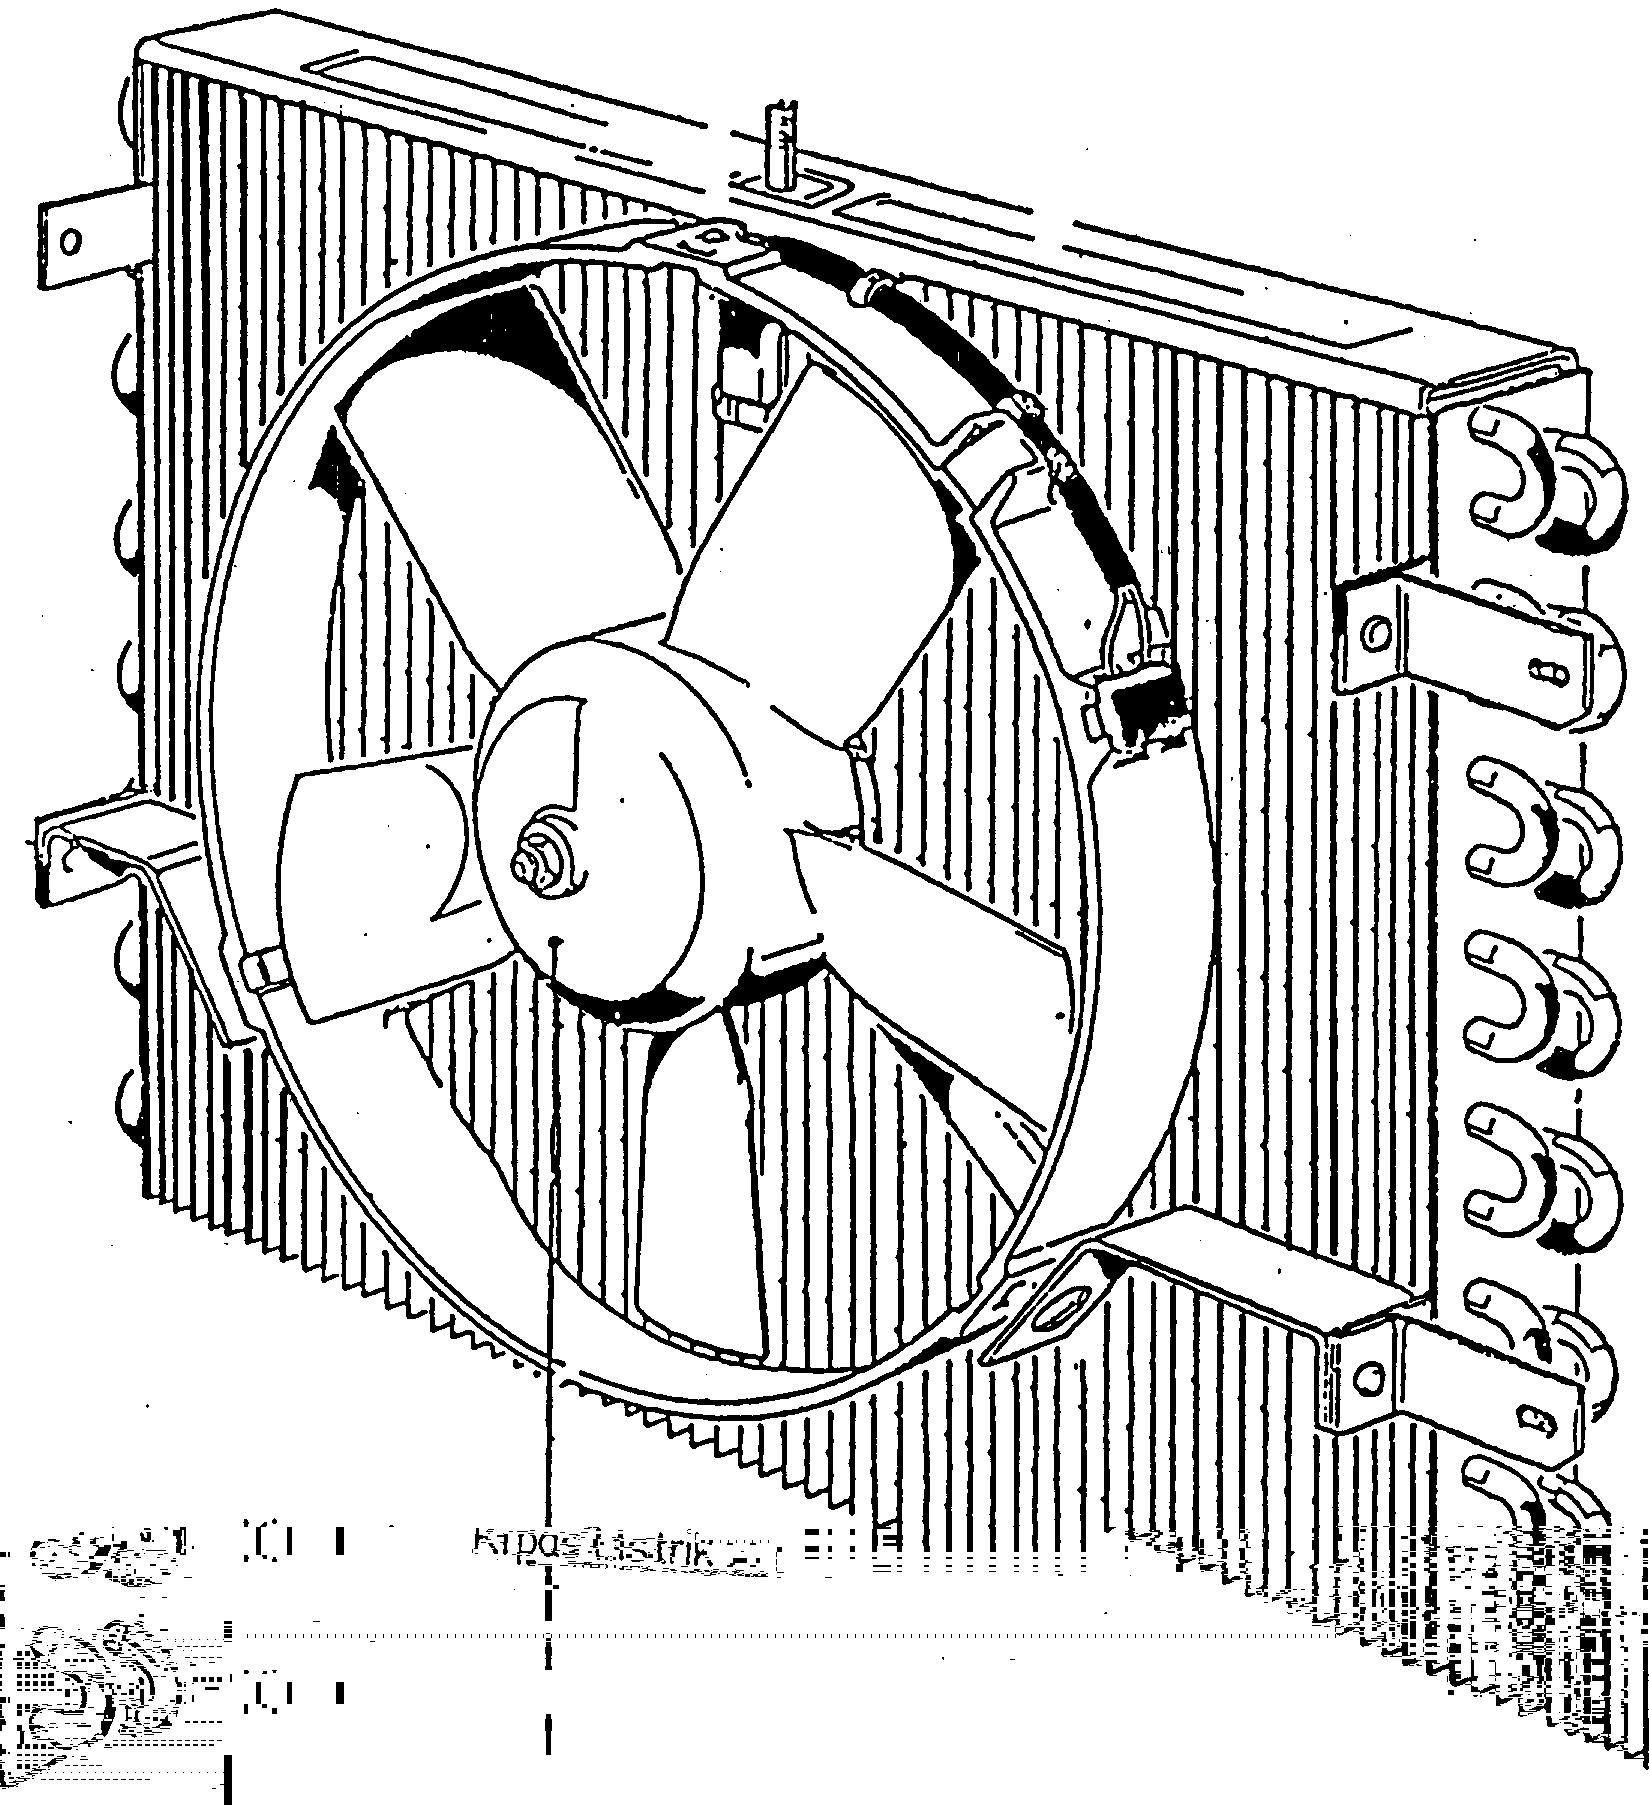 Adakalanya pemasangan kondensor di depan radiator tidak dilengkapi  title=